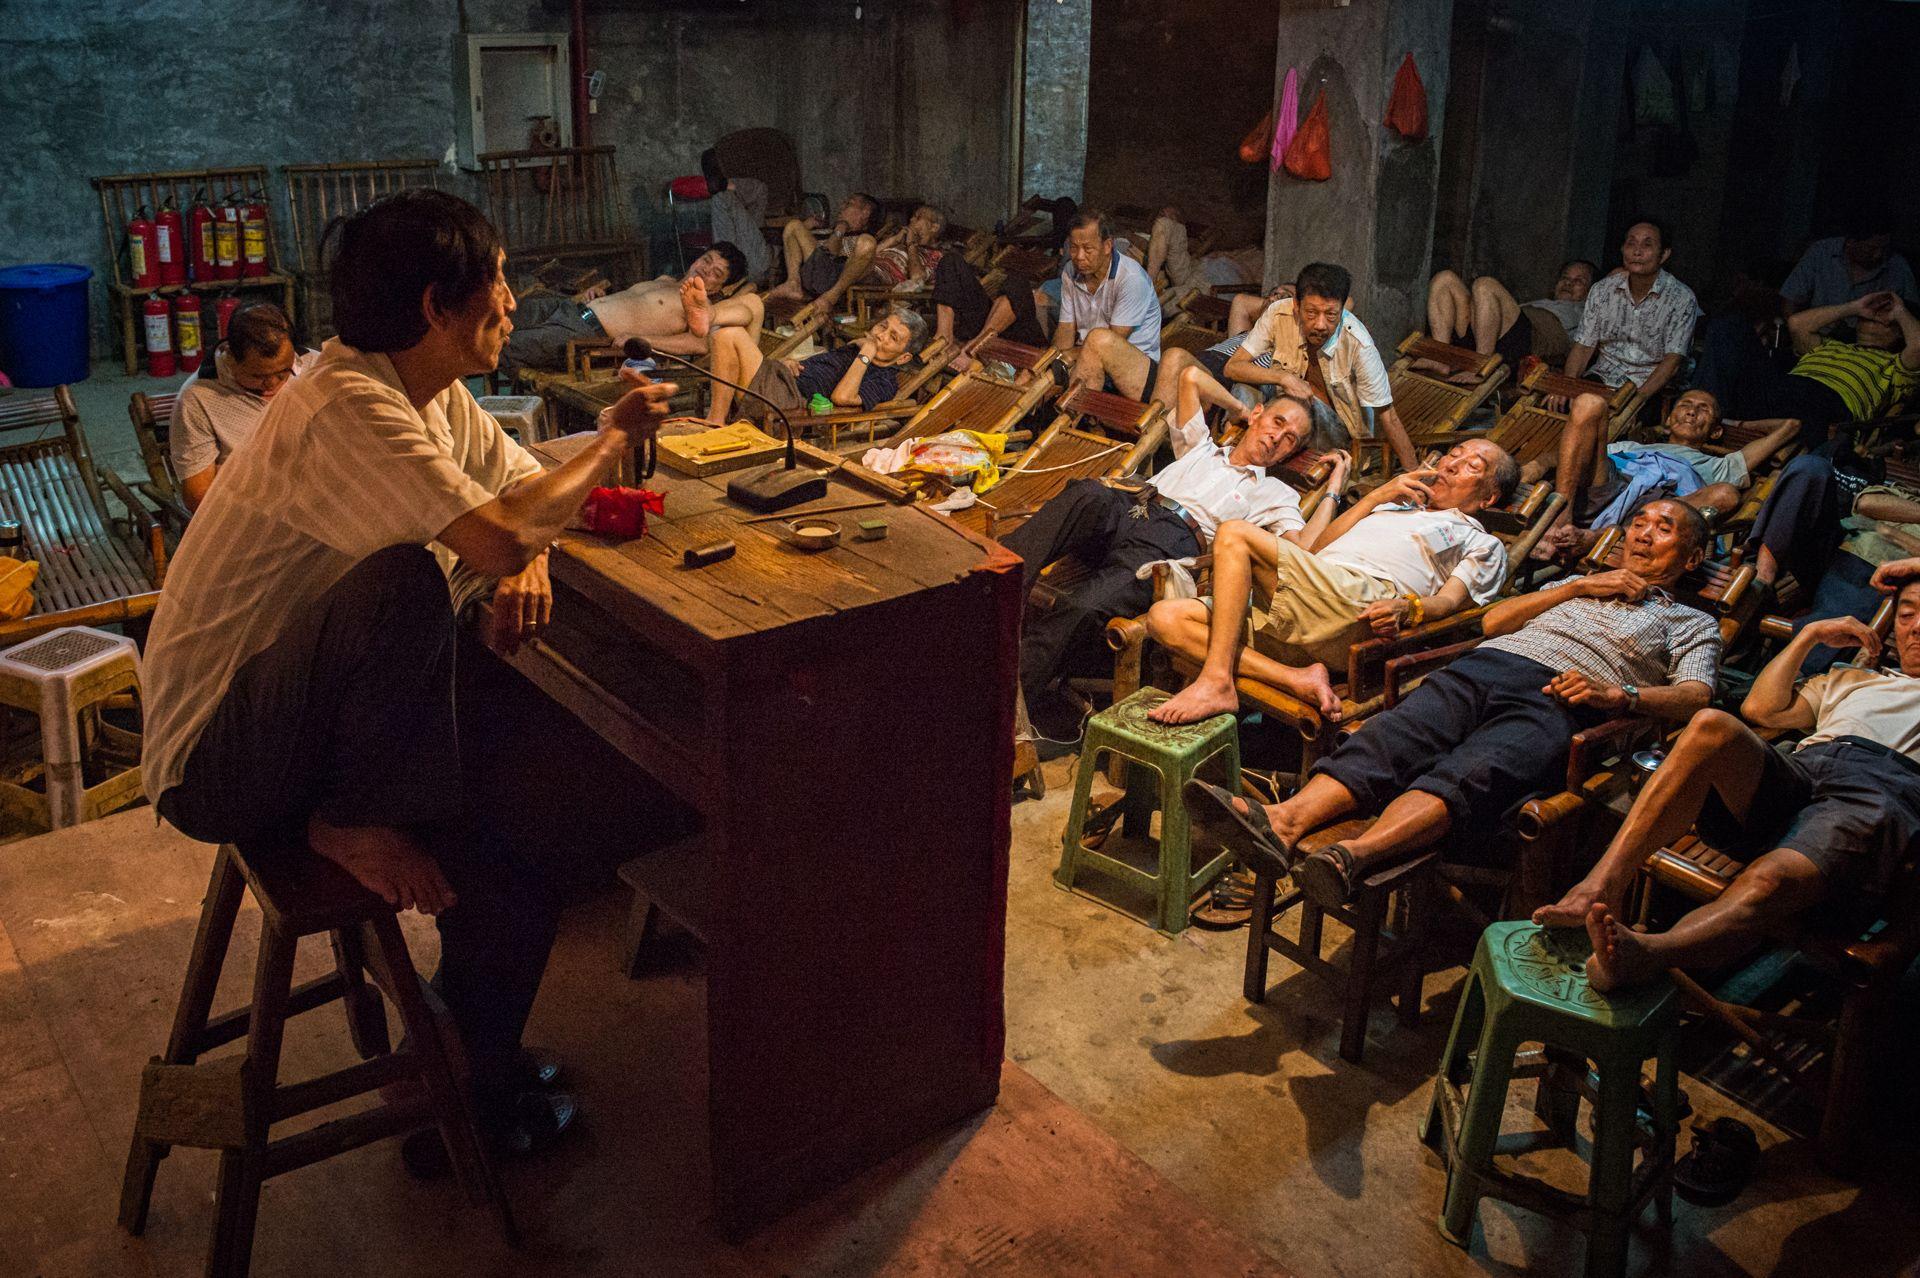 Storytelling by Aimin Wang